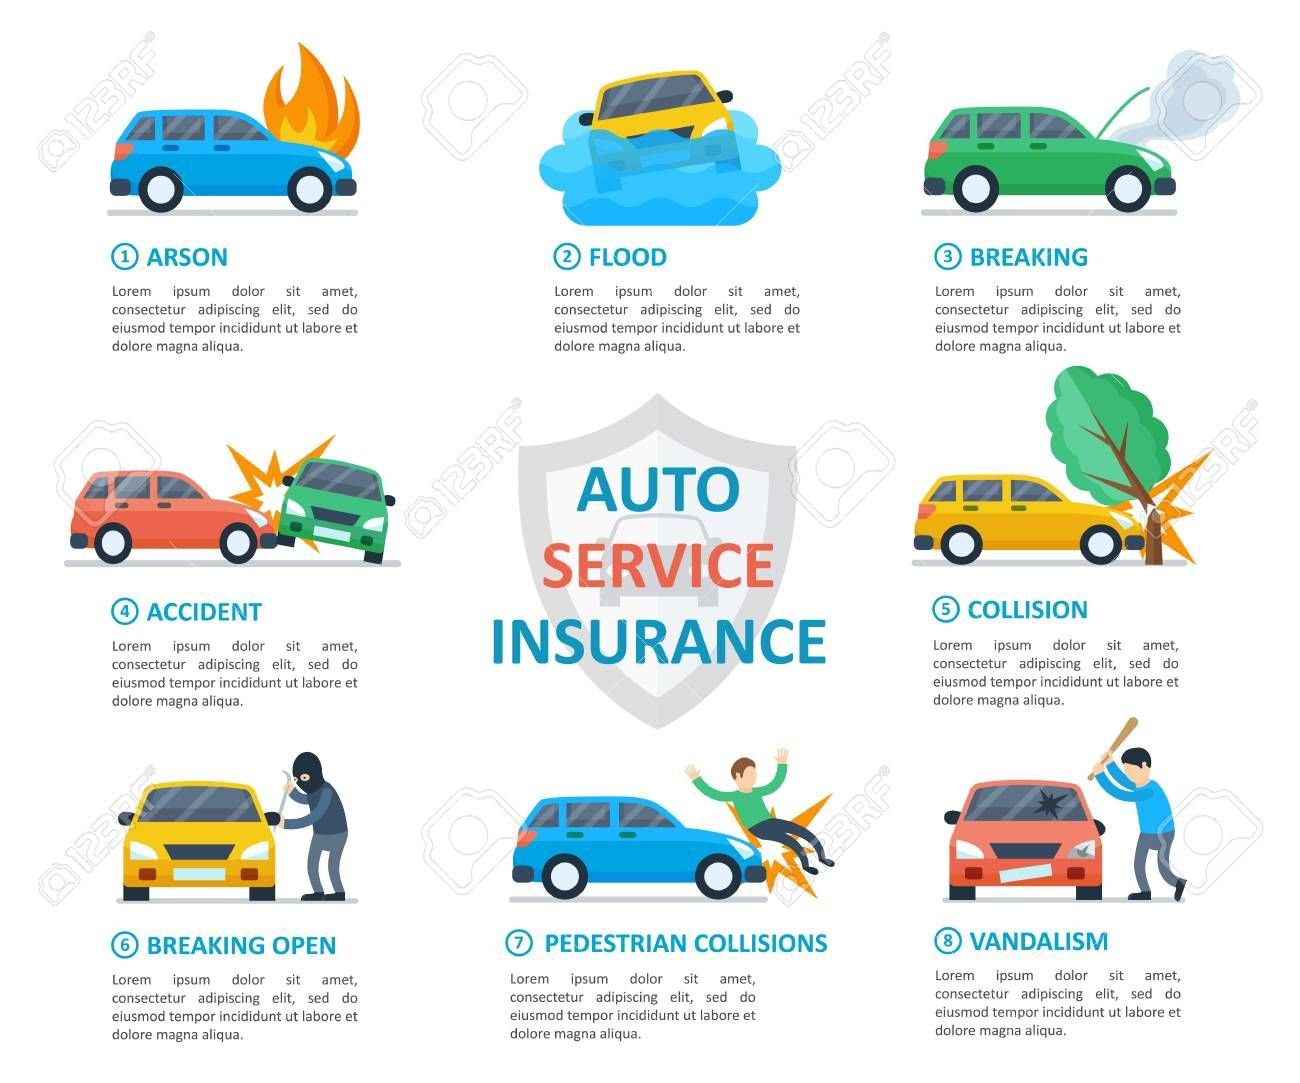 Vandalism Car Insurance Google Search Auto Service Car